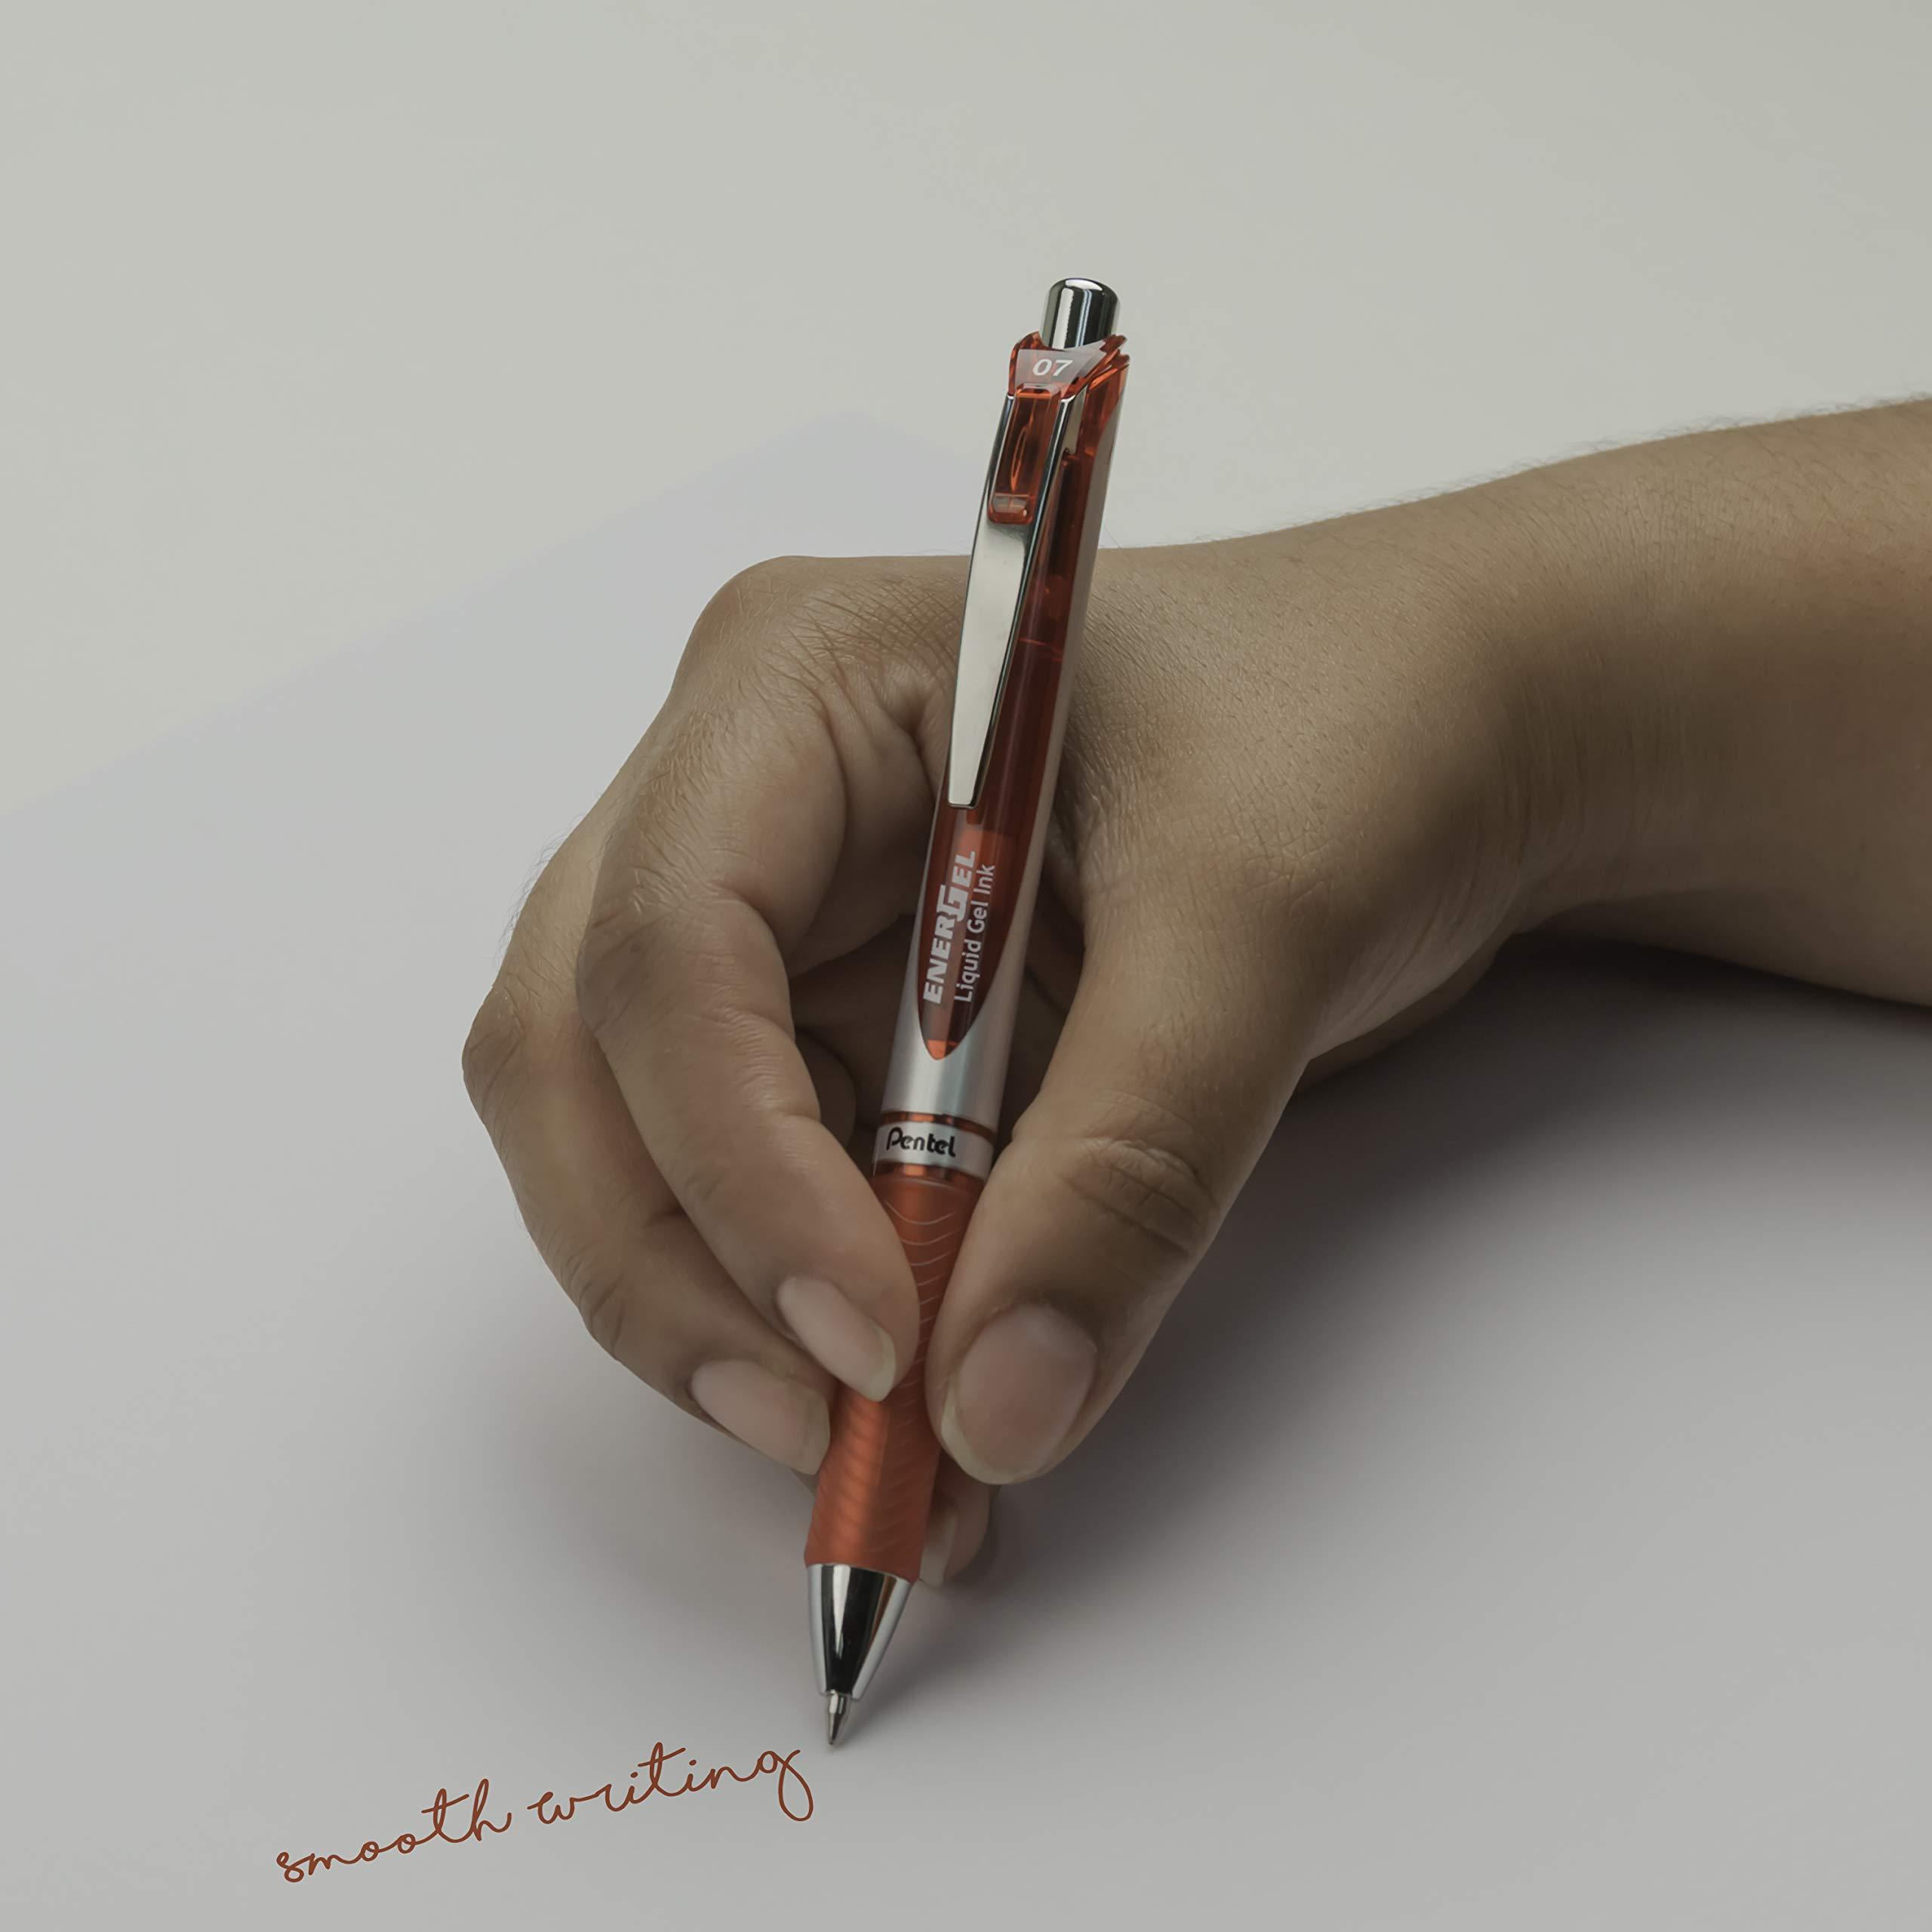 Pentel EnerGel RTX Retractable Liquid Gel Pen Canister, Red Ink, 36pk (BL77PC36B) by Pentel (Image #8)